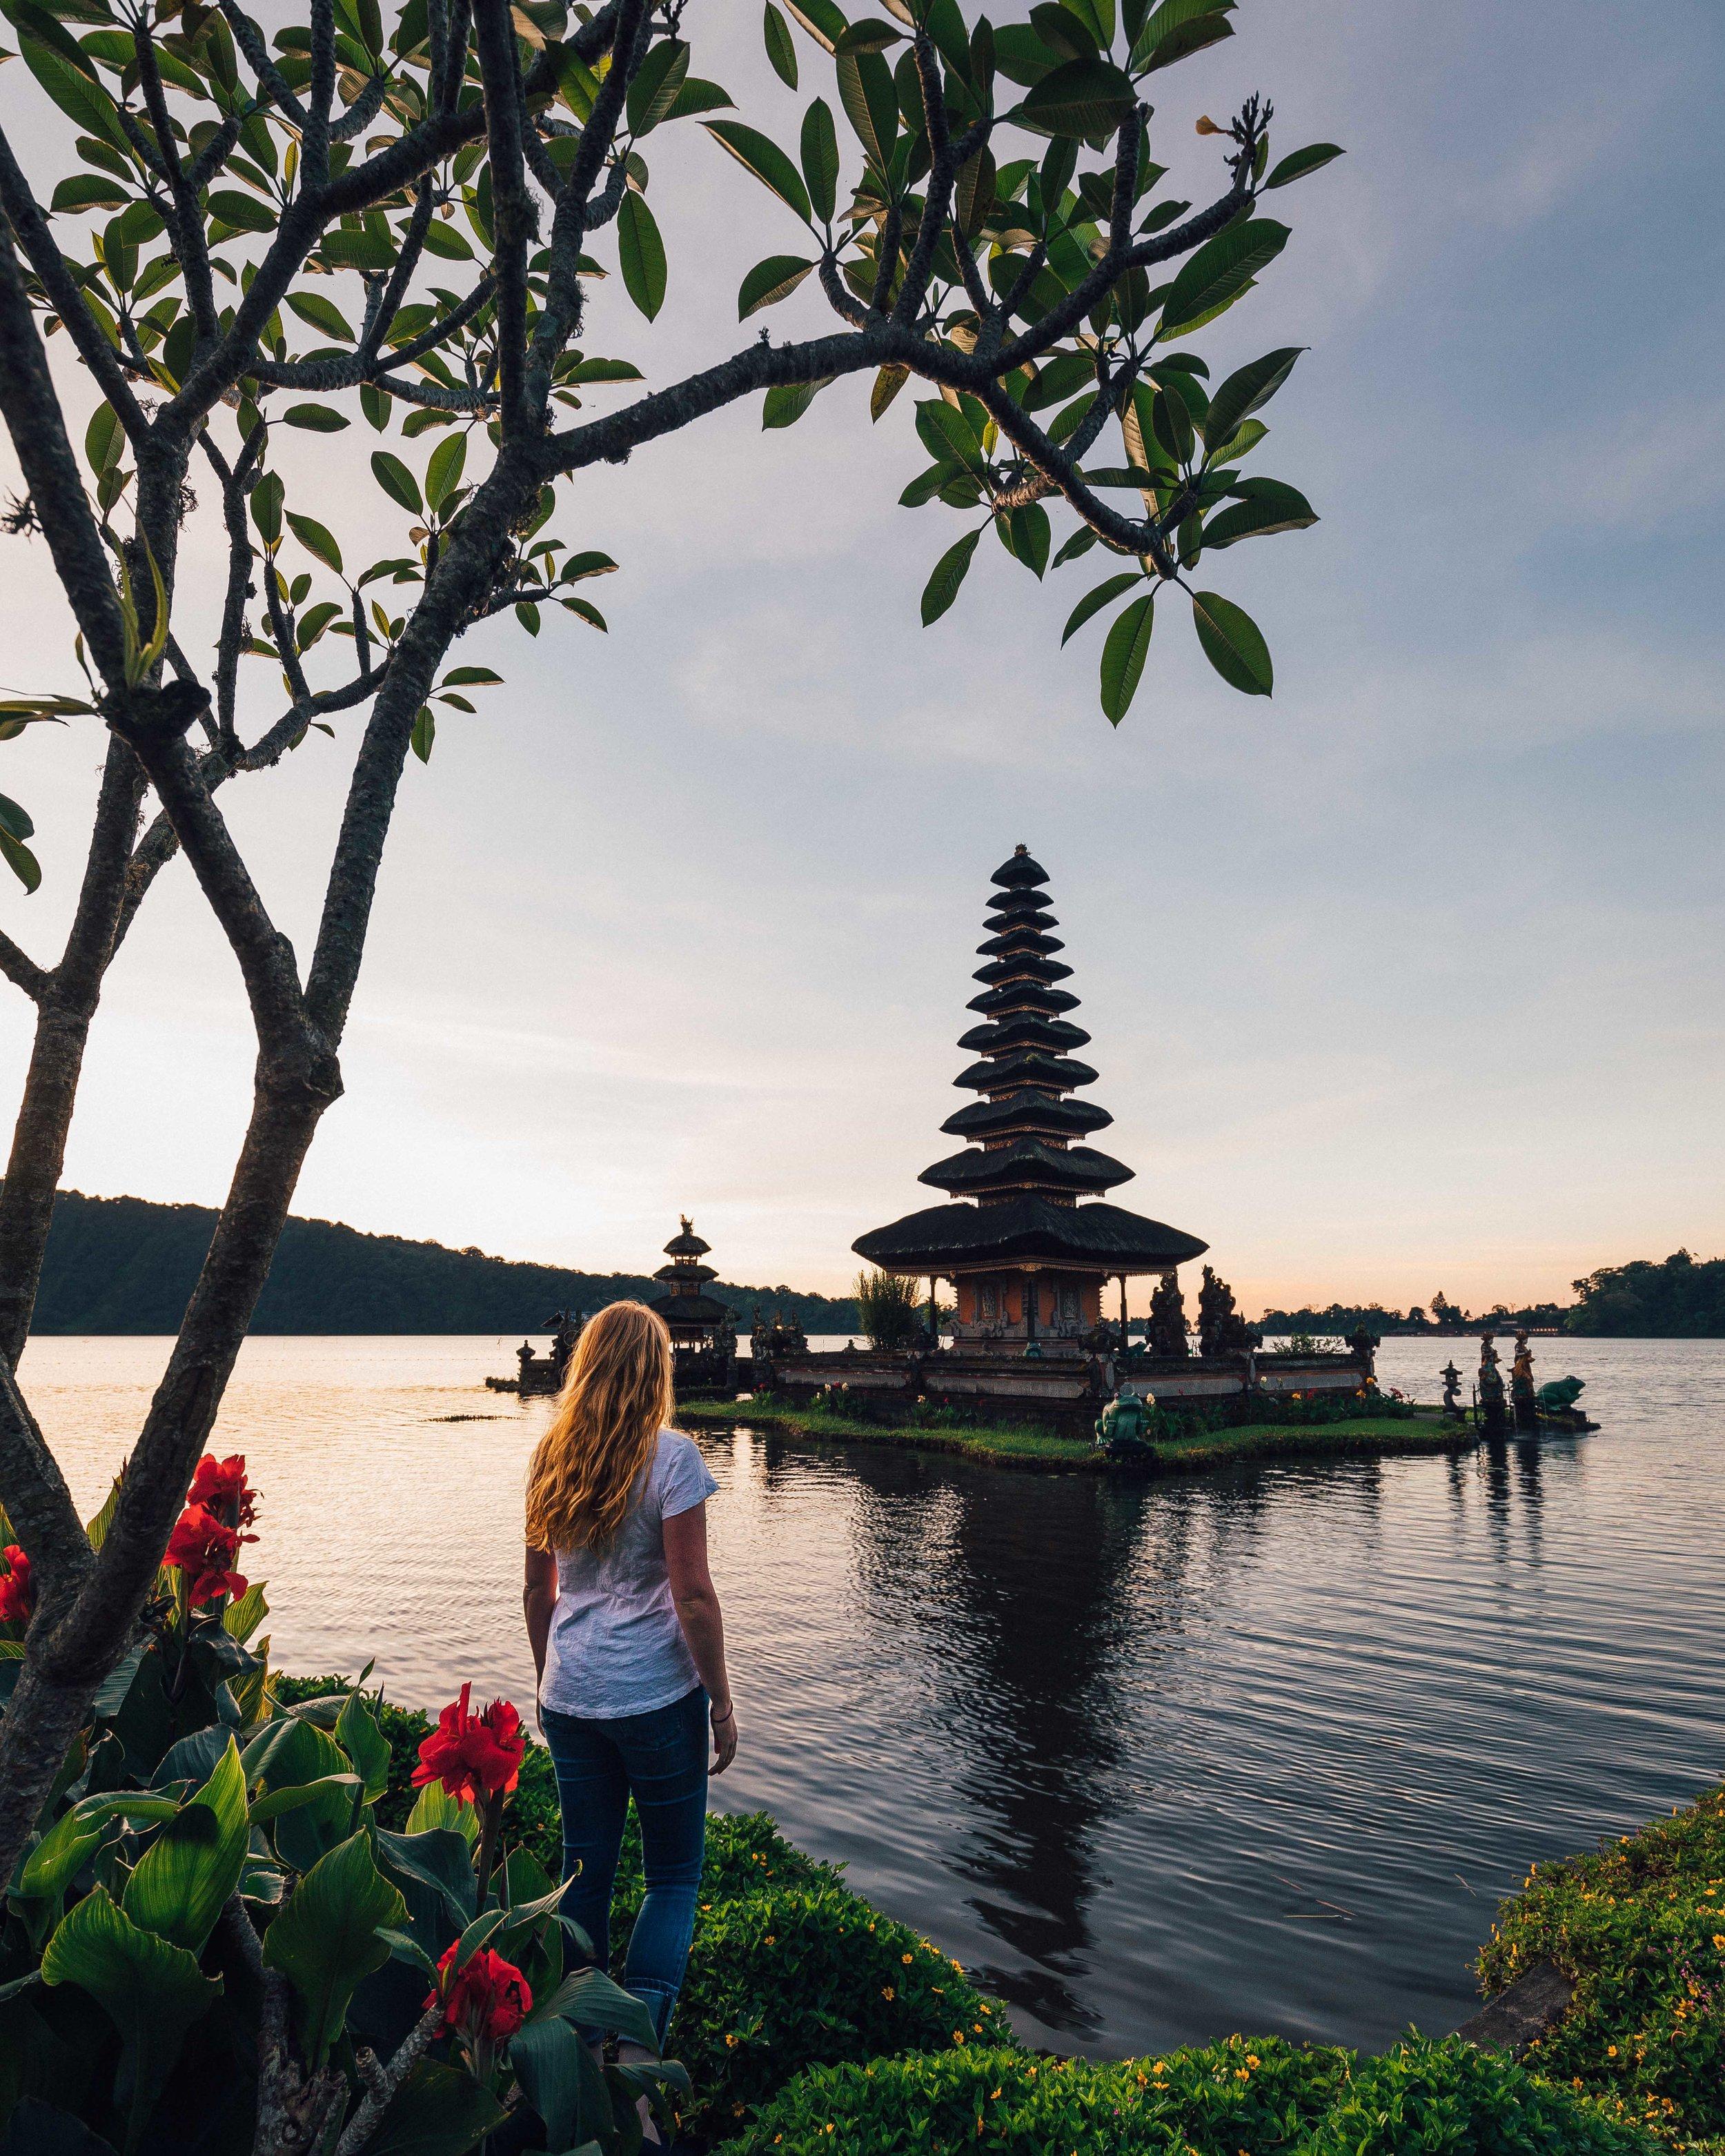 Bali Itinerary 7 Days: Pura Ulun Danu Bratan